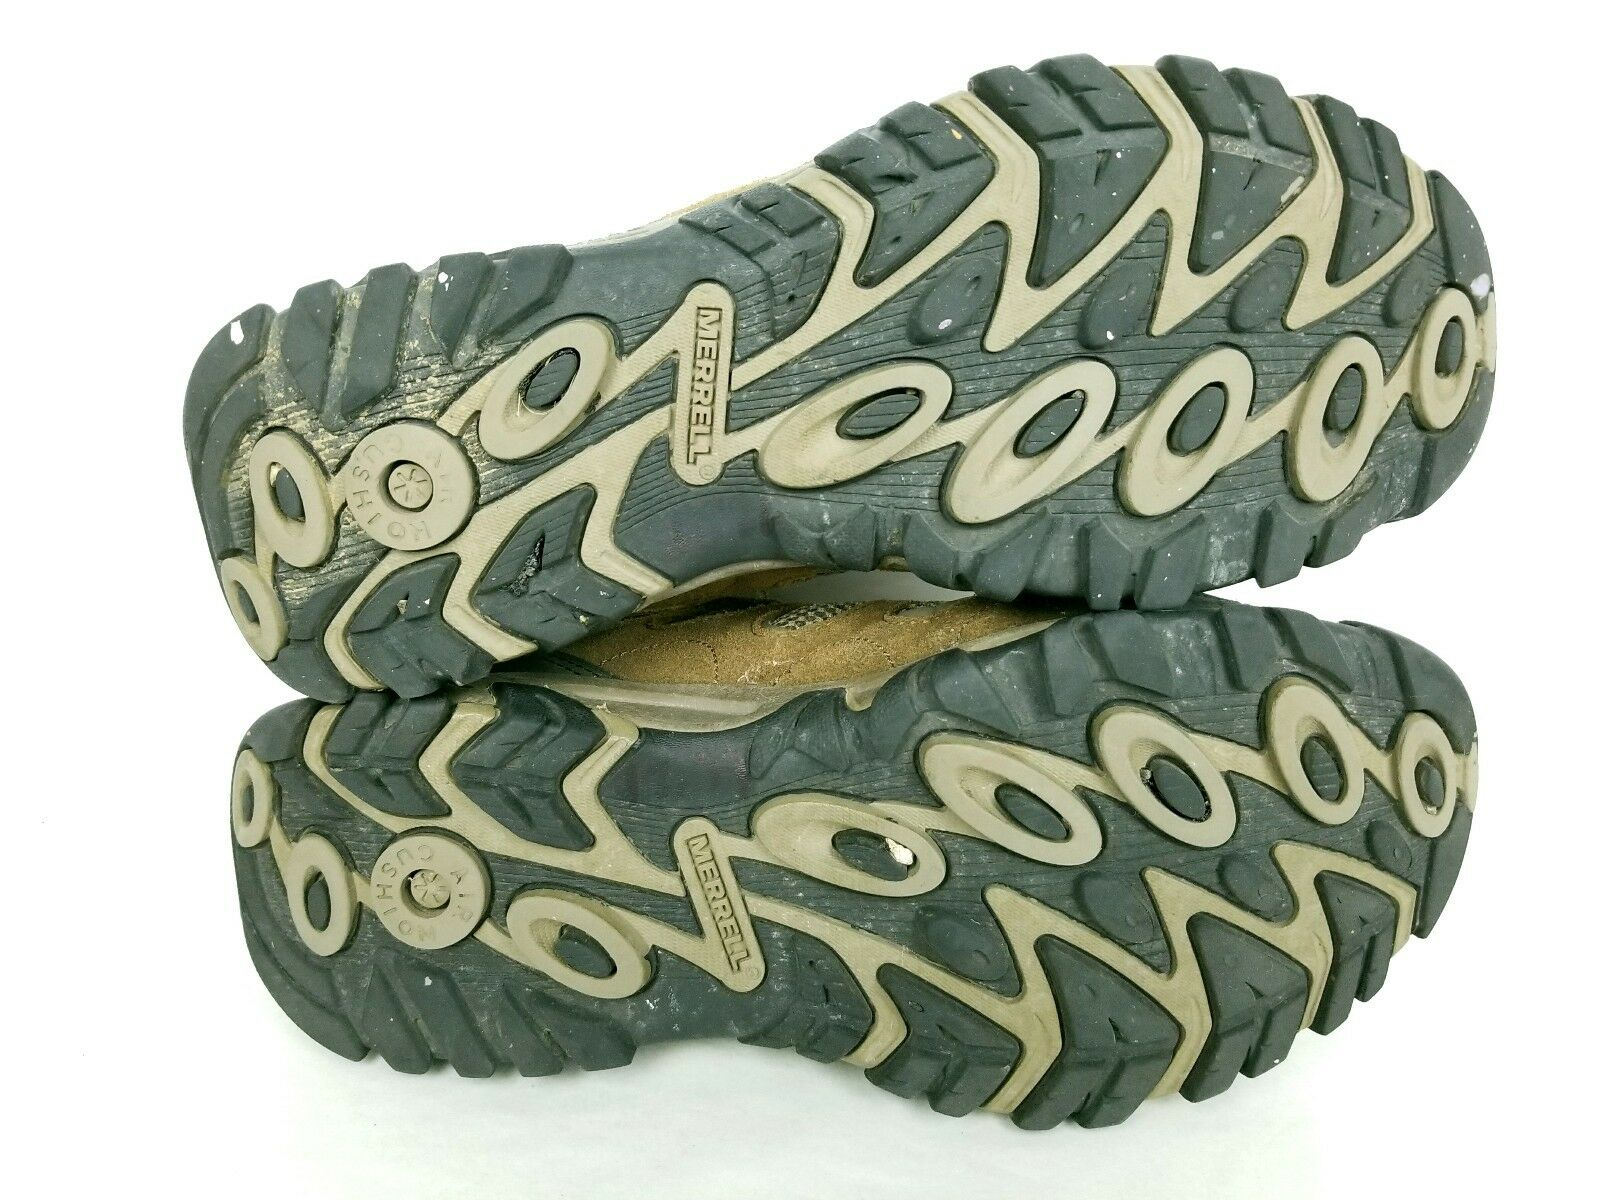 Merrell Womens 8.5 Performance Shoe Footwear Ventilator Hiking Trail Shoe Performance Air Cushion f8b755